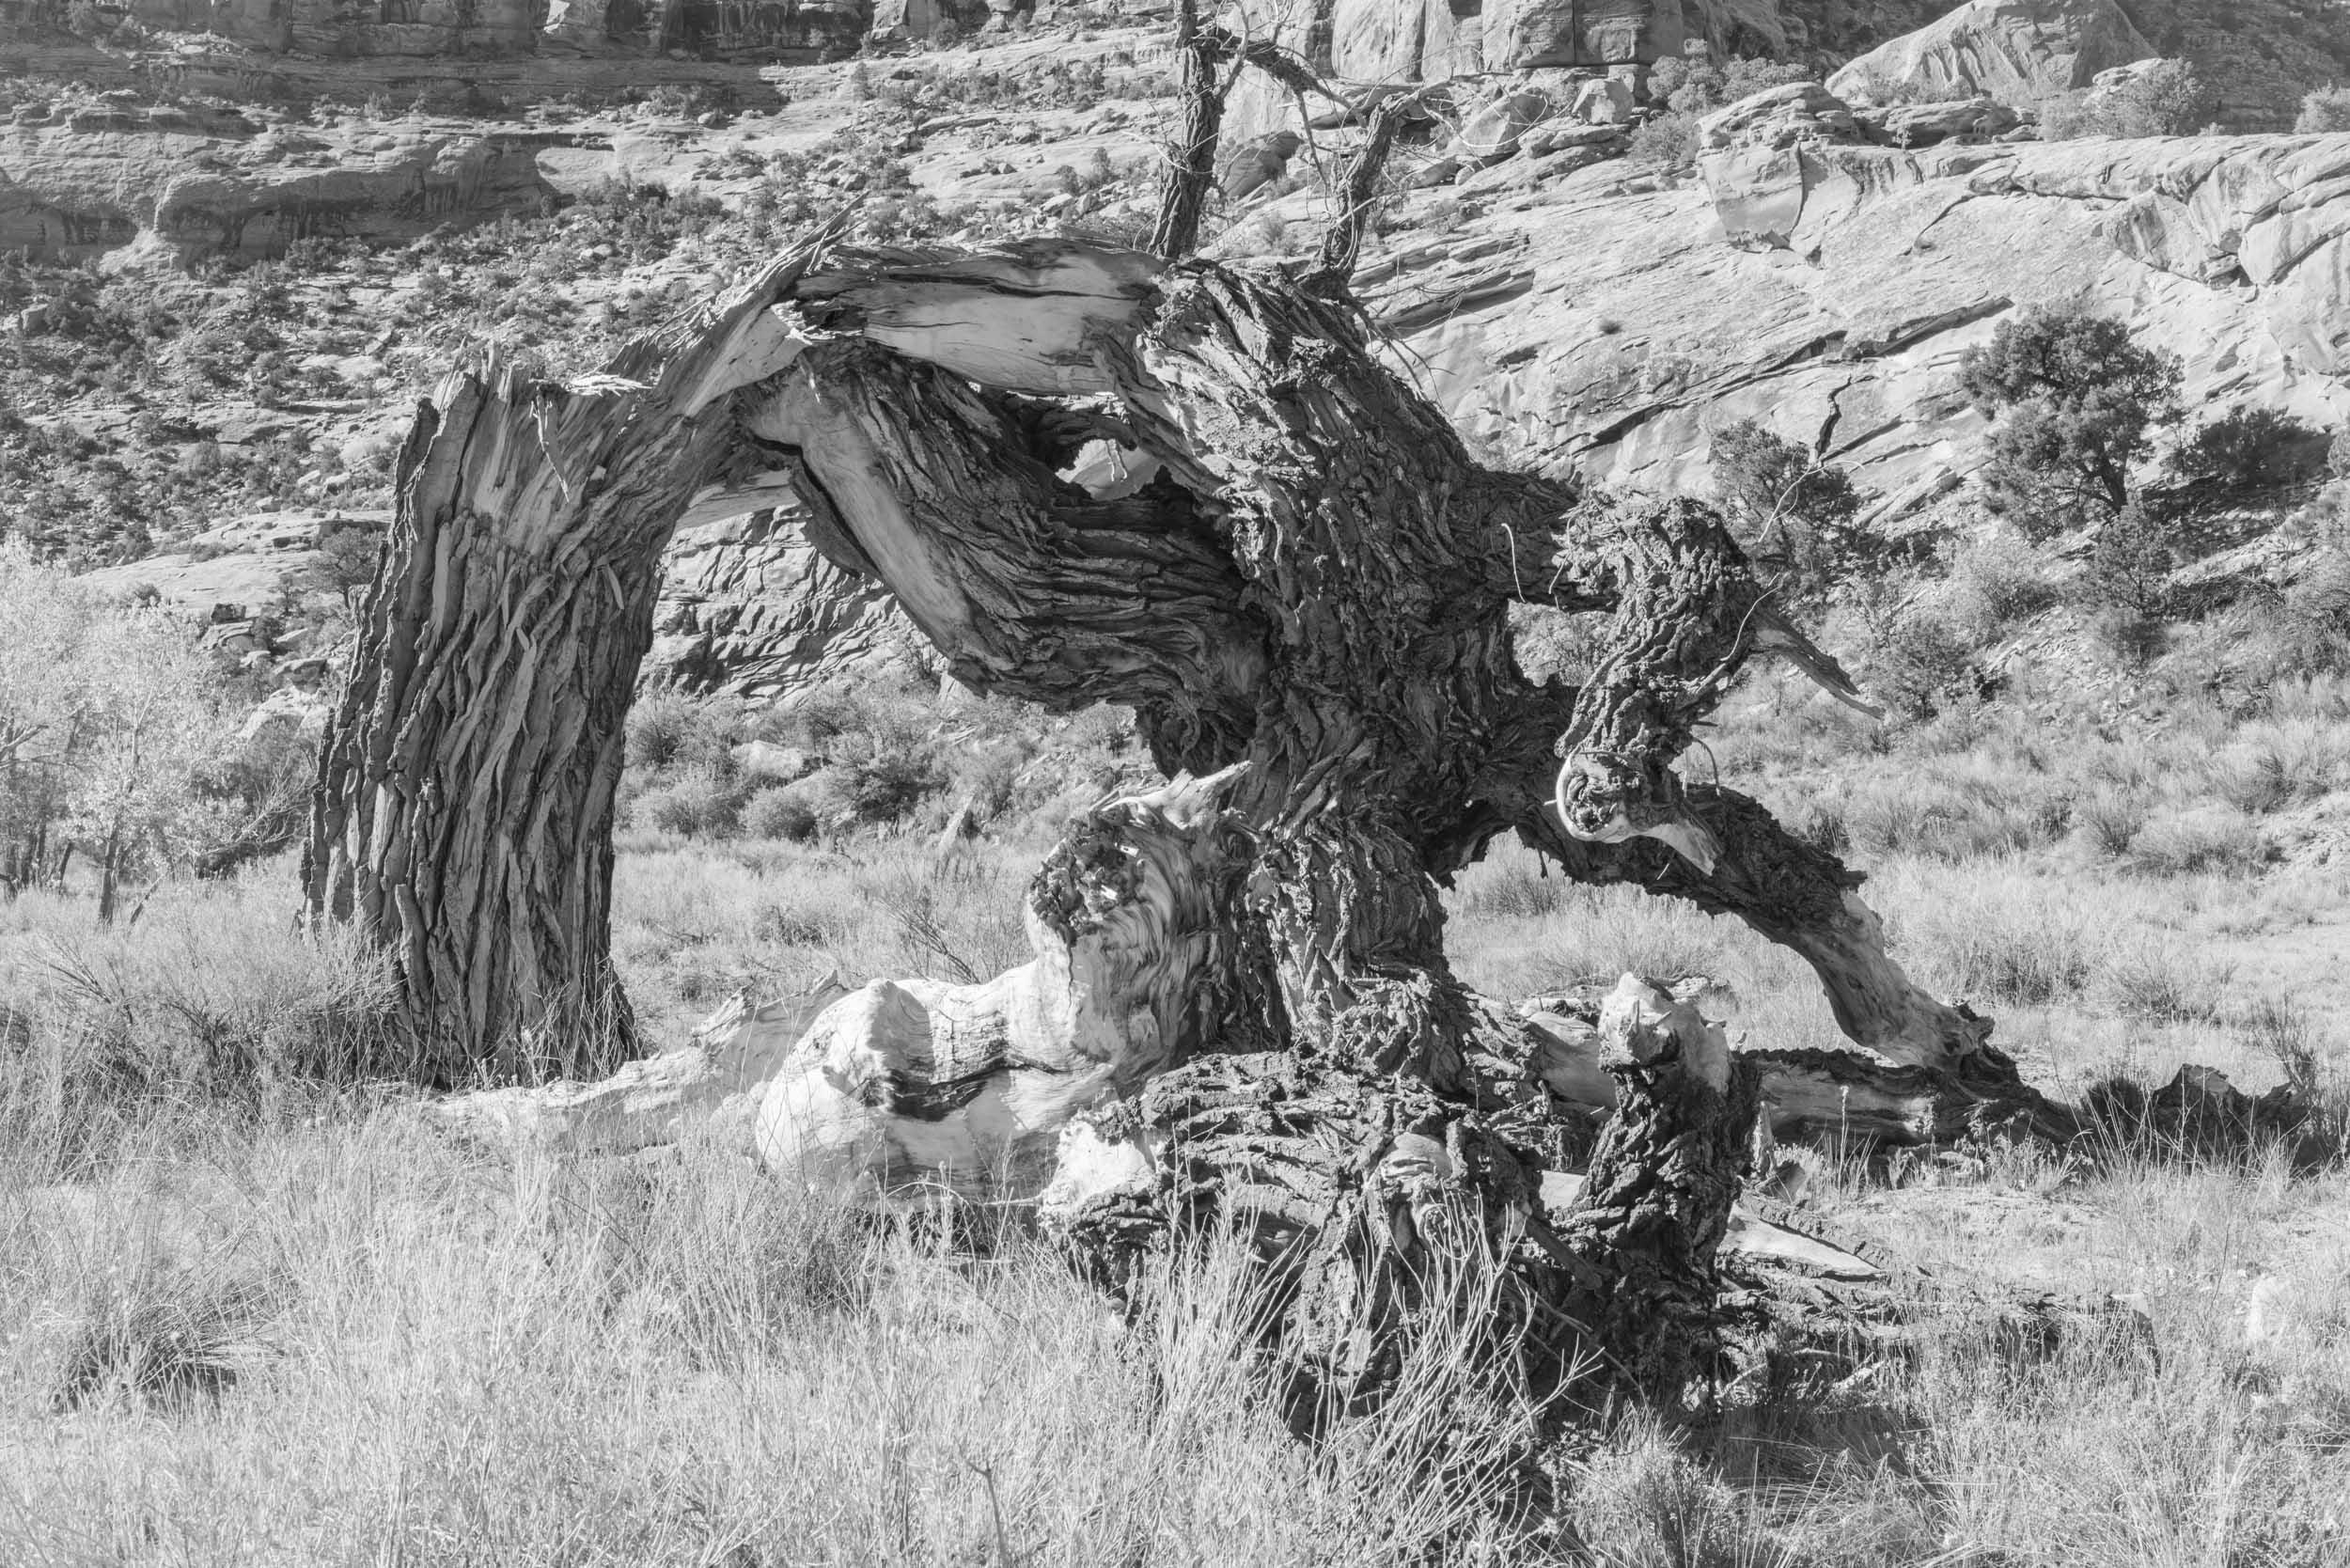 A twisted cottonwood near the Spanish Trail in Buckhorn Wash, San Rafael Swell, Utah.